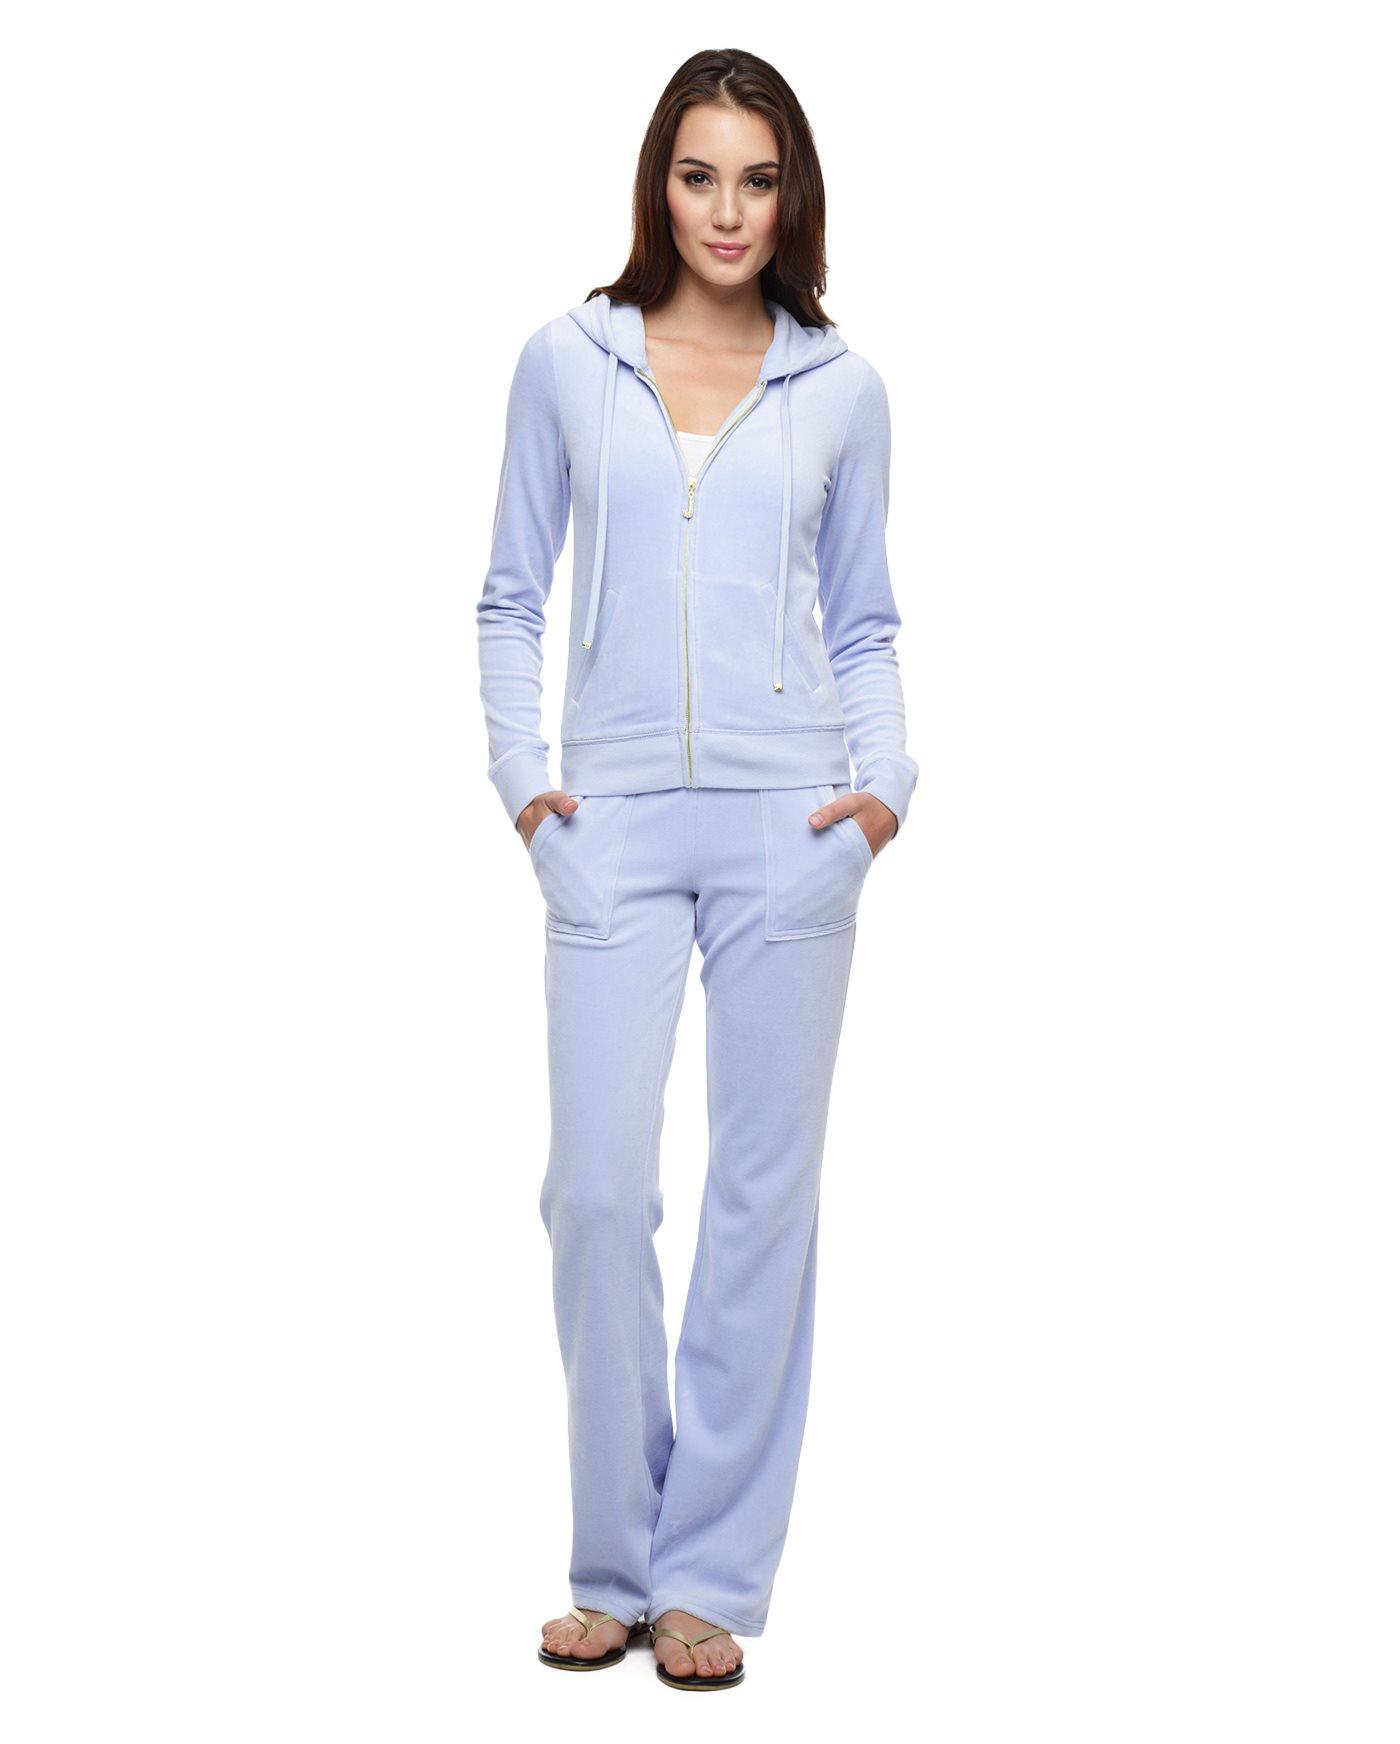 Juicy Couture J Bling Original Velour Jacket In Blue